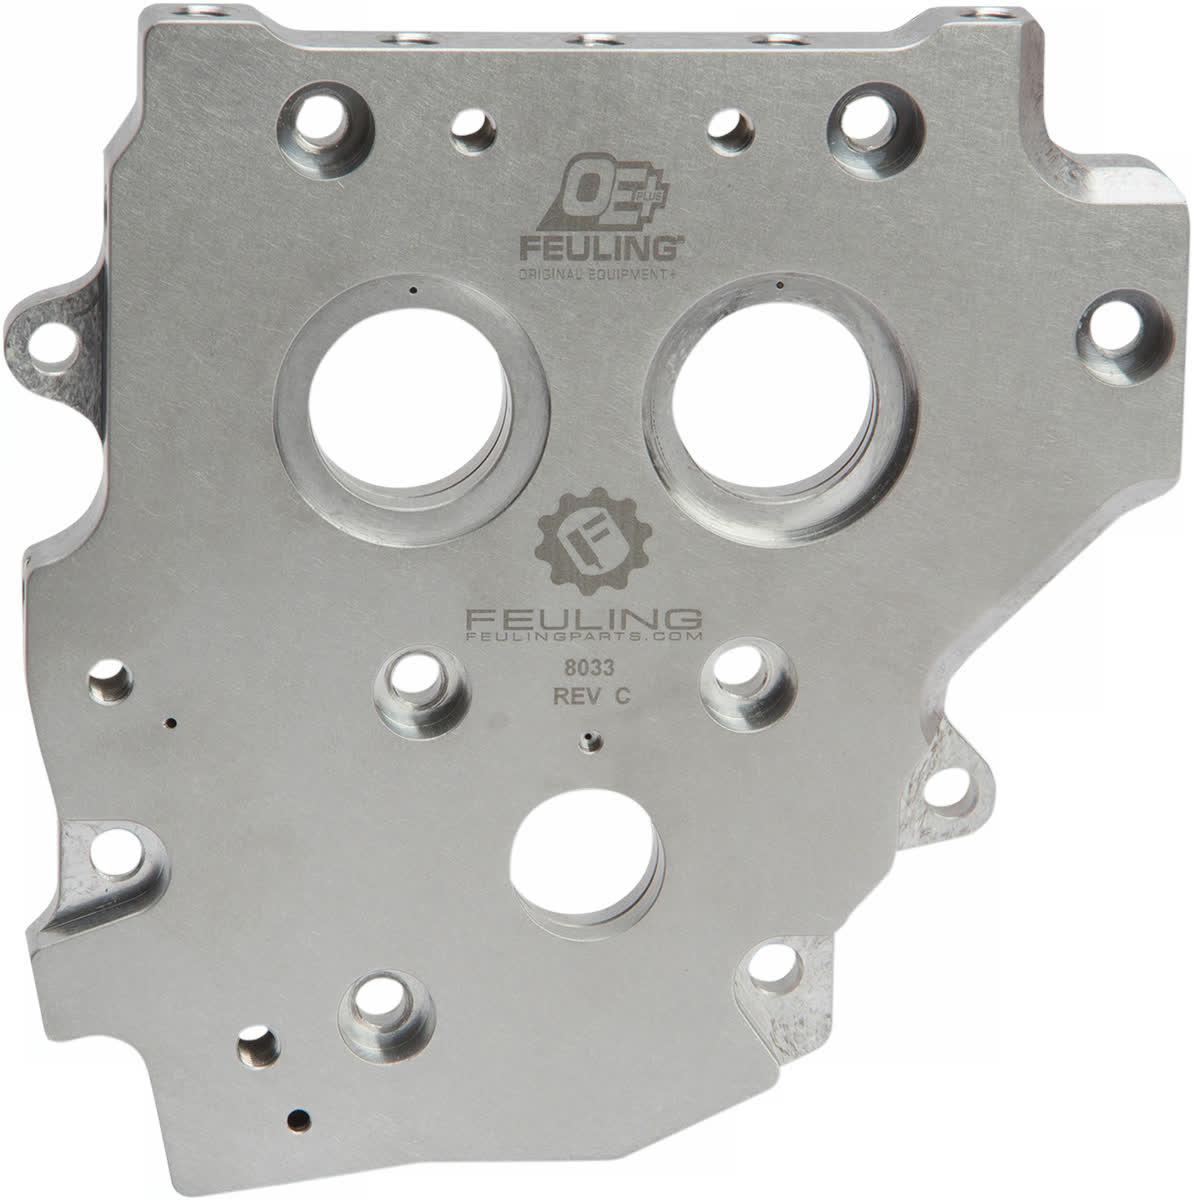 Feuling 8033 Oe+ Cam Plate 07-17 Chain Or Gear Drive